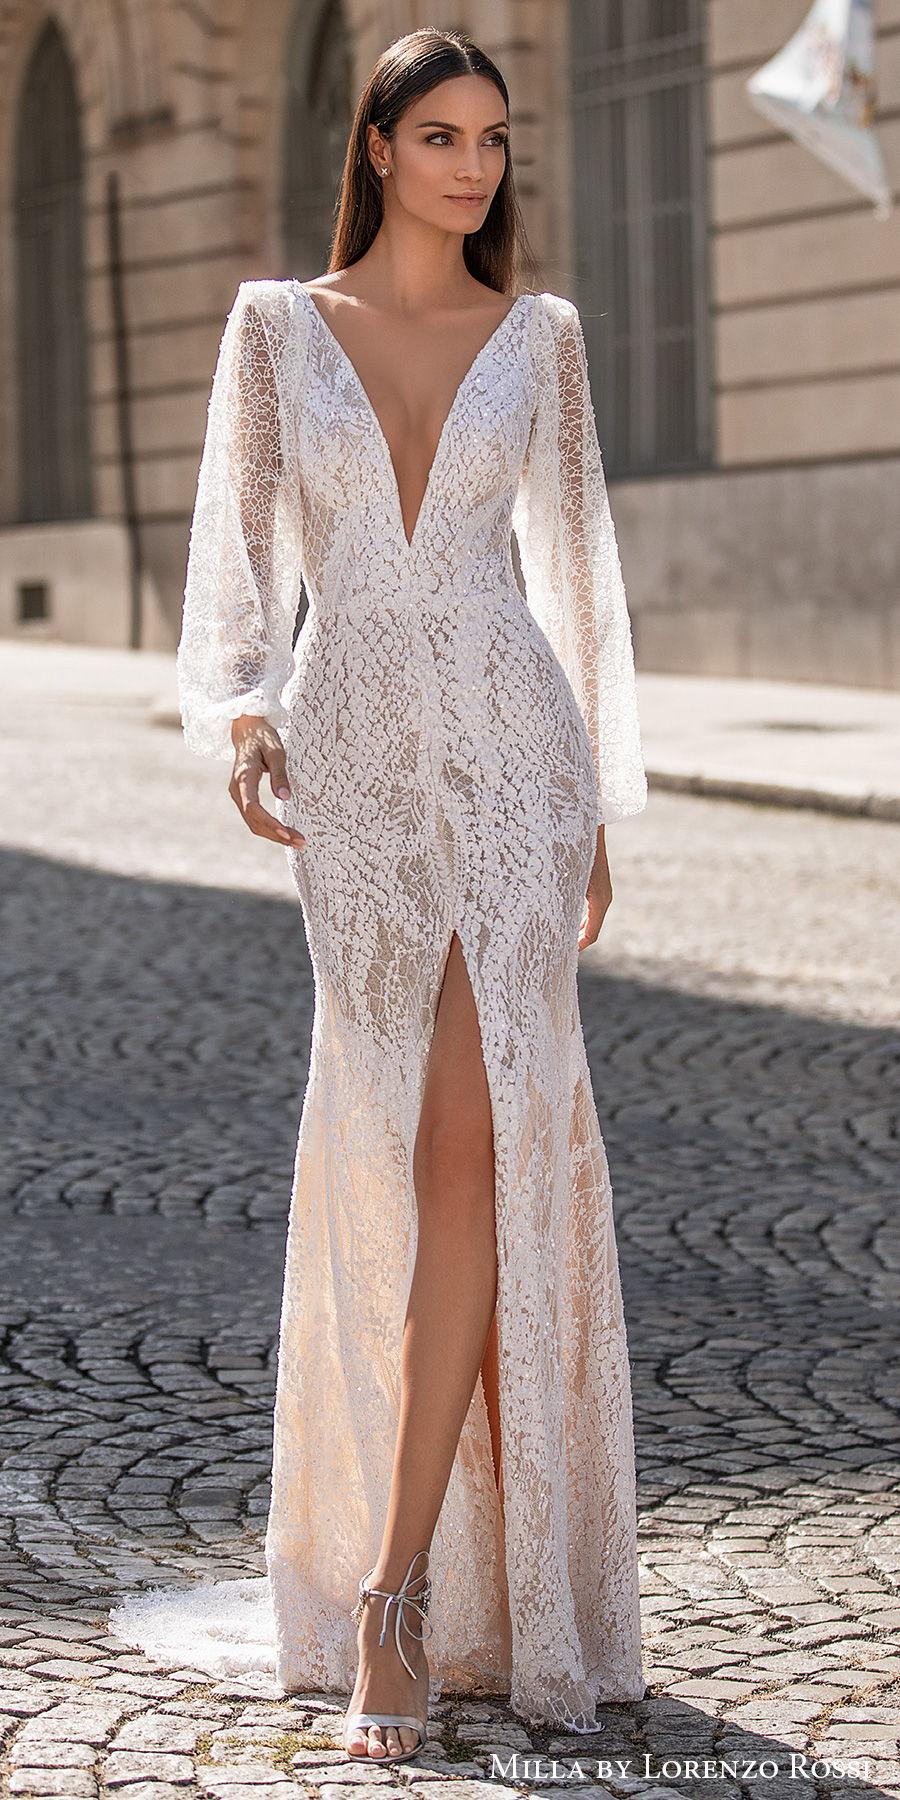 milla lorenzo rossi 2021 bridal long bishop sleeves deep plunging v neck full embellisment slit skirt sexy elegant sheath wedding dress v back short train (dominique) mv